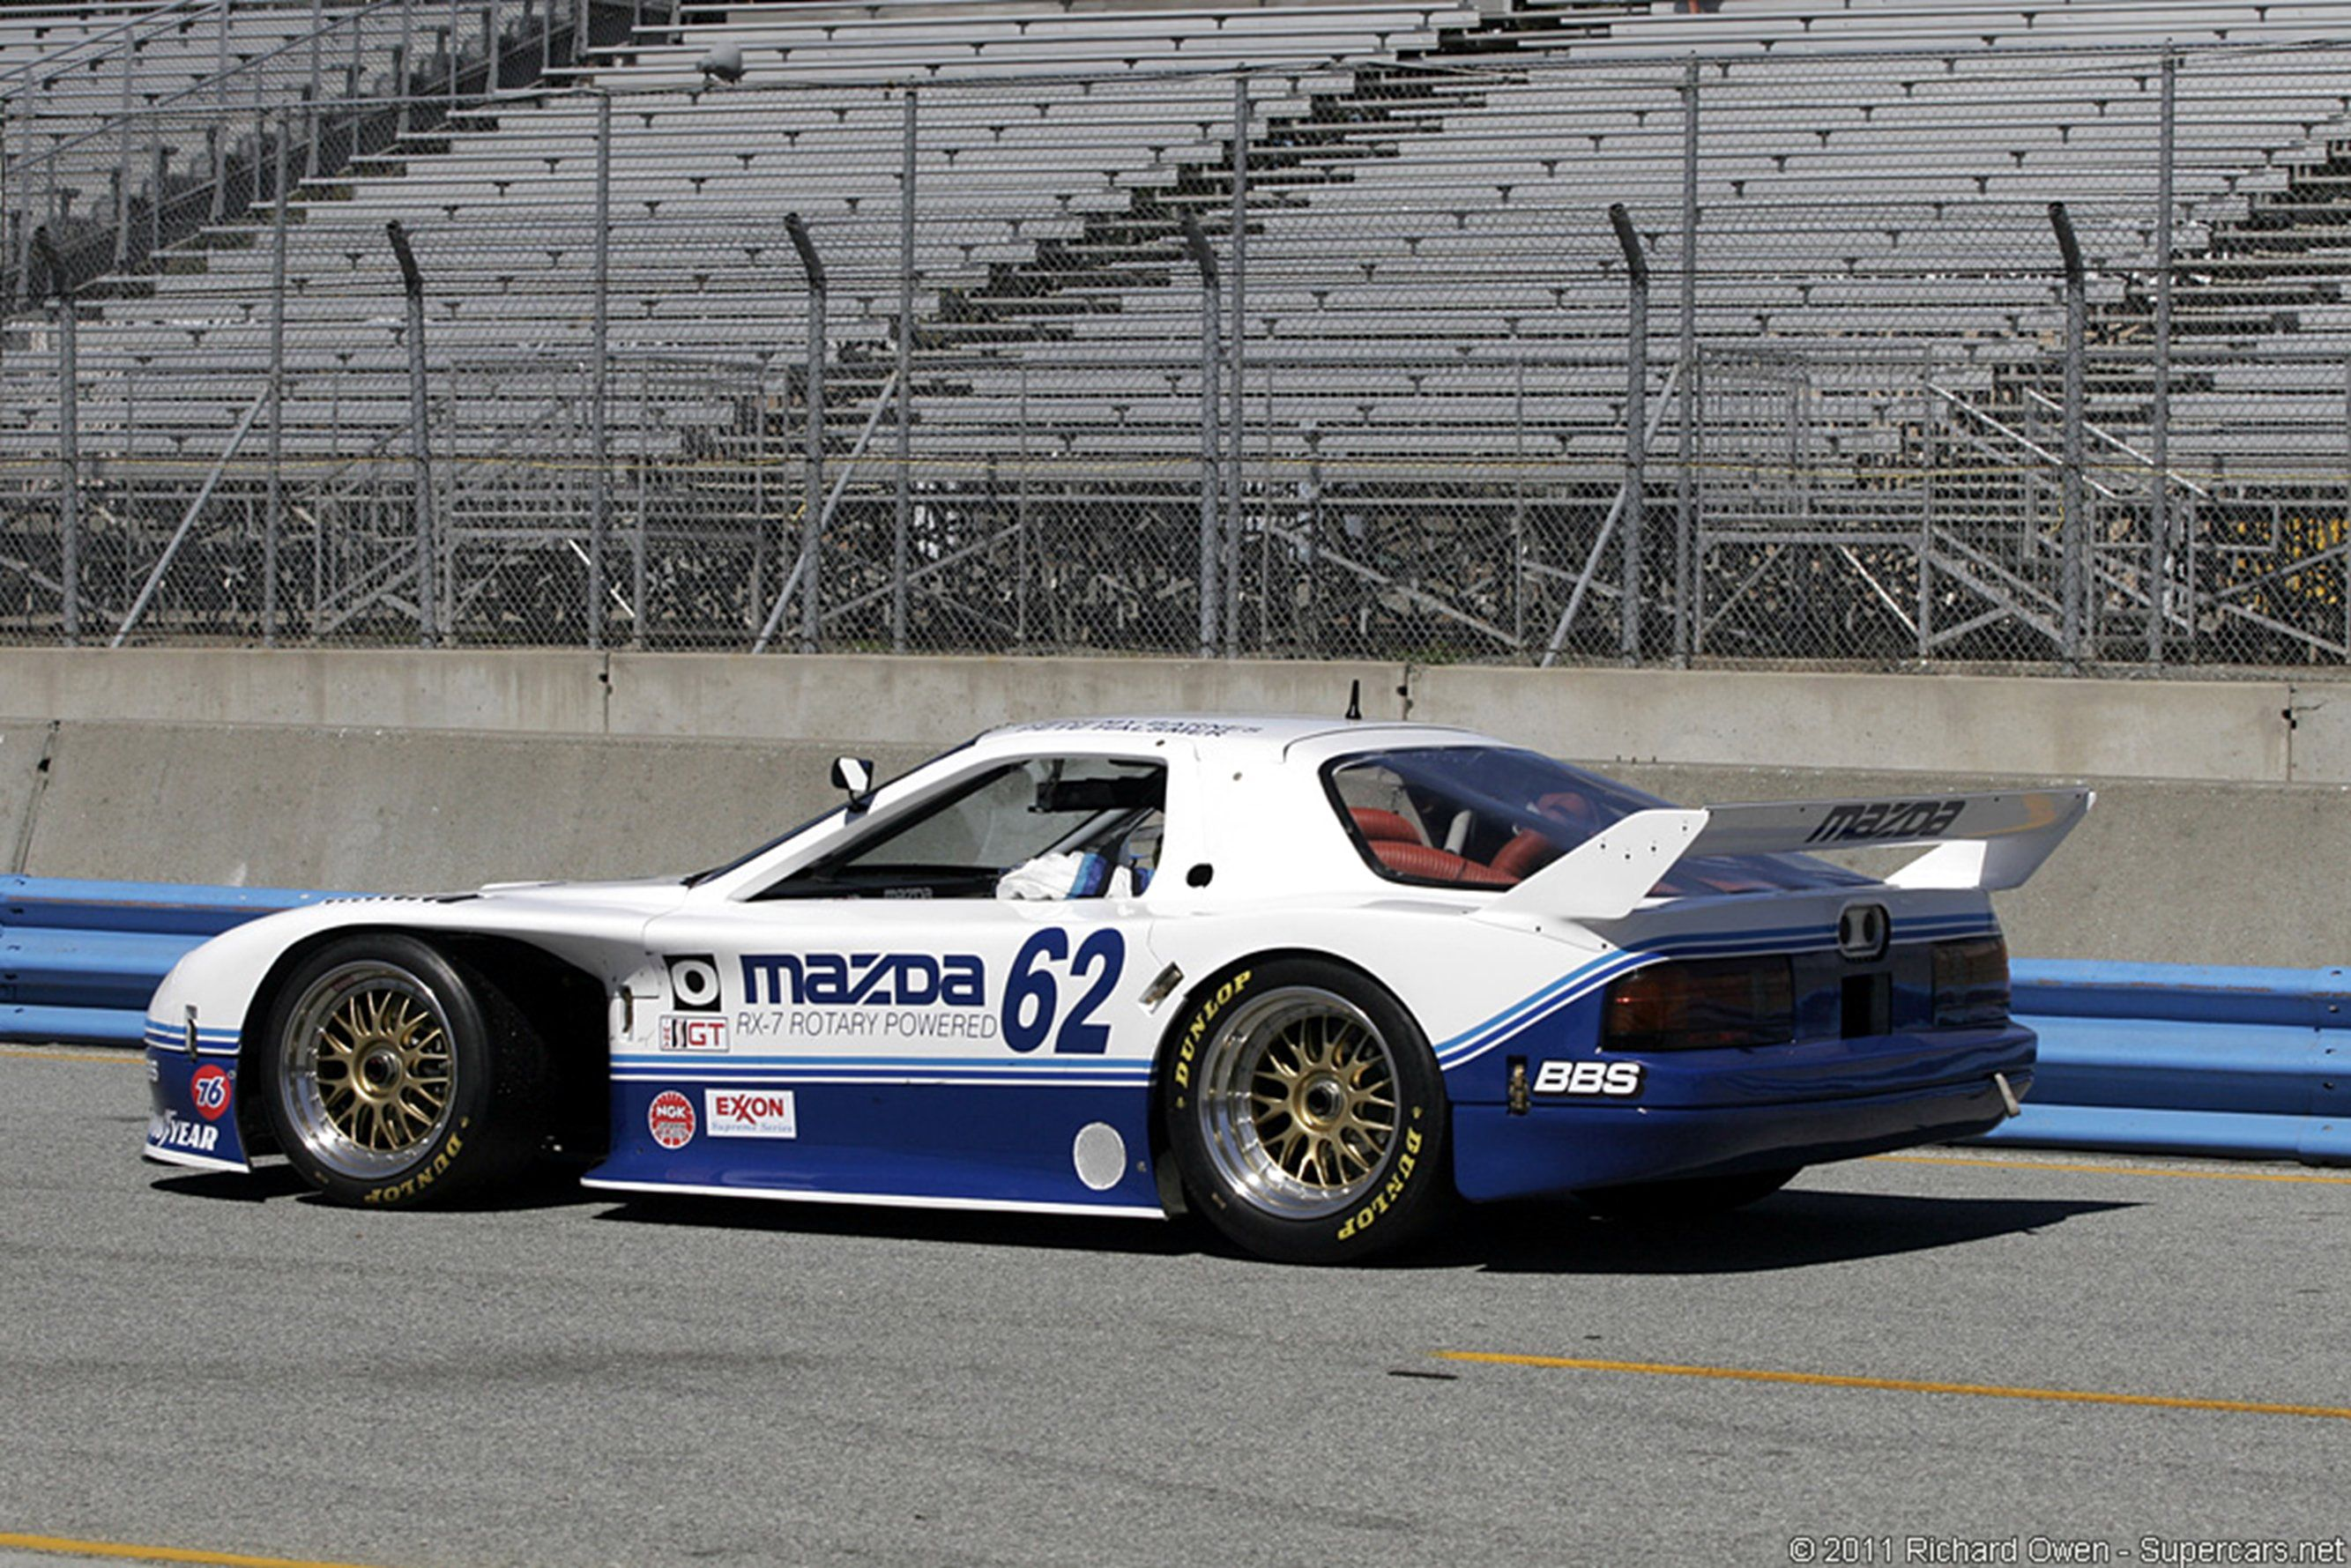 Imsa Wide Body Kit Rx7 >> Mazda RX-7 (FC) IMSA GTU | Classic Cars | Pinterest | Mazda, Car photos and Cars